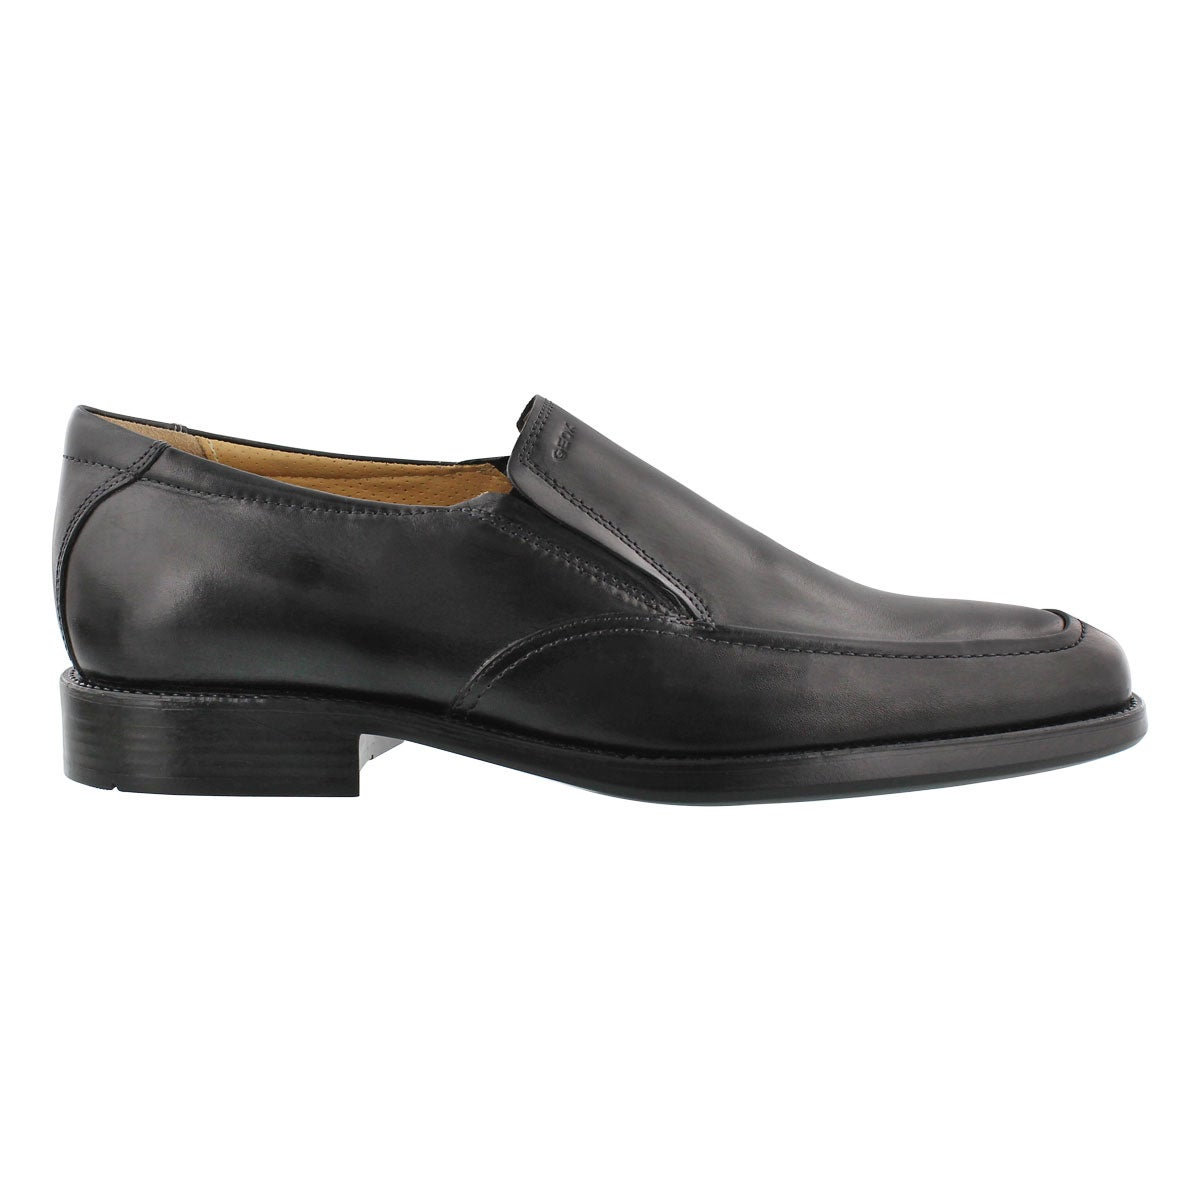 Mns Federico black slip on dress shoe